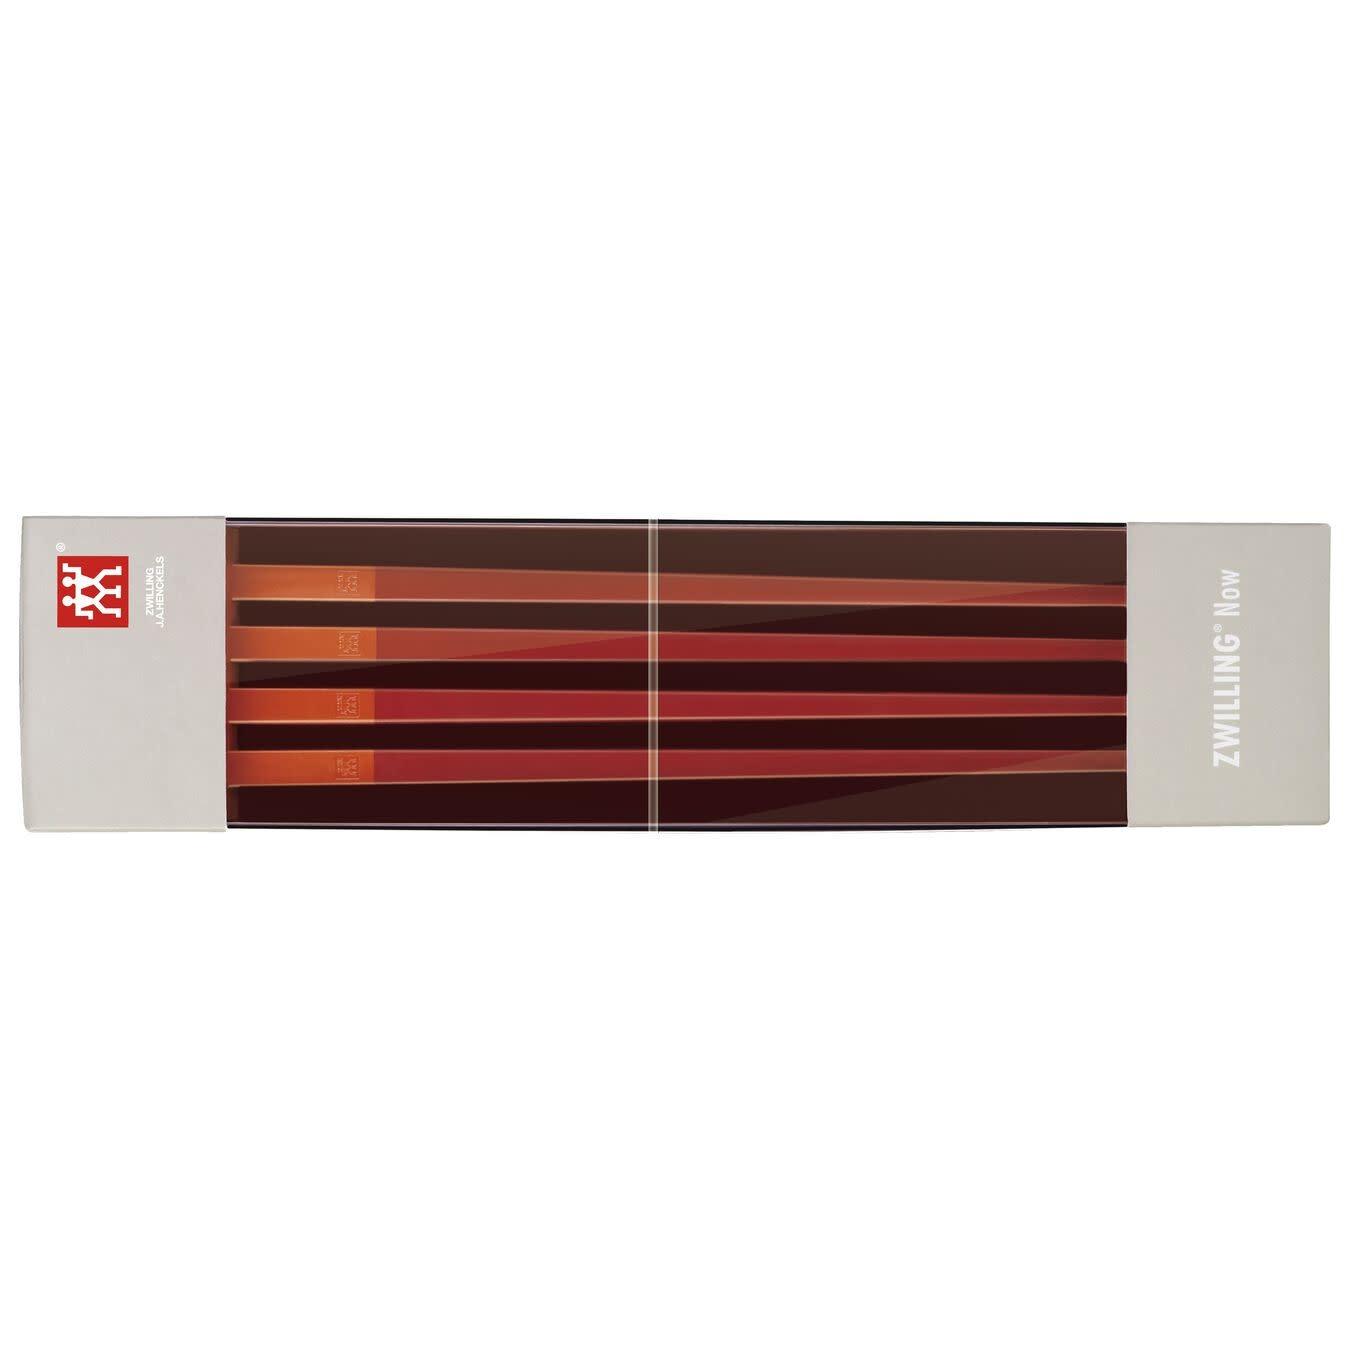 ZWILLING Now Chopsticks 4pc - Granada